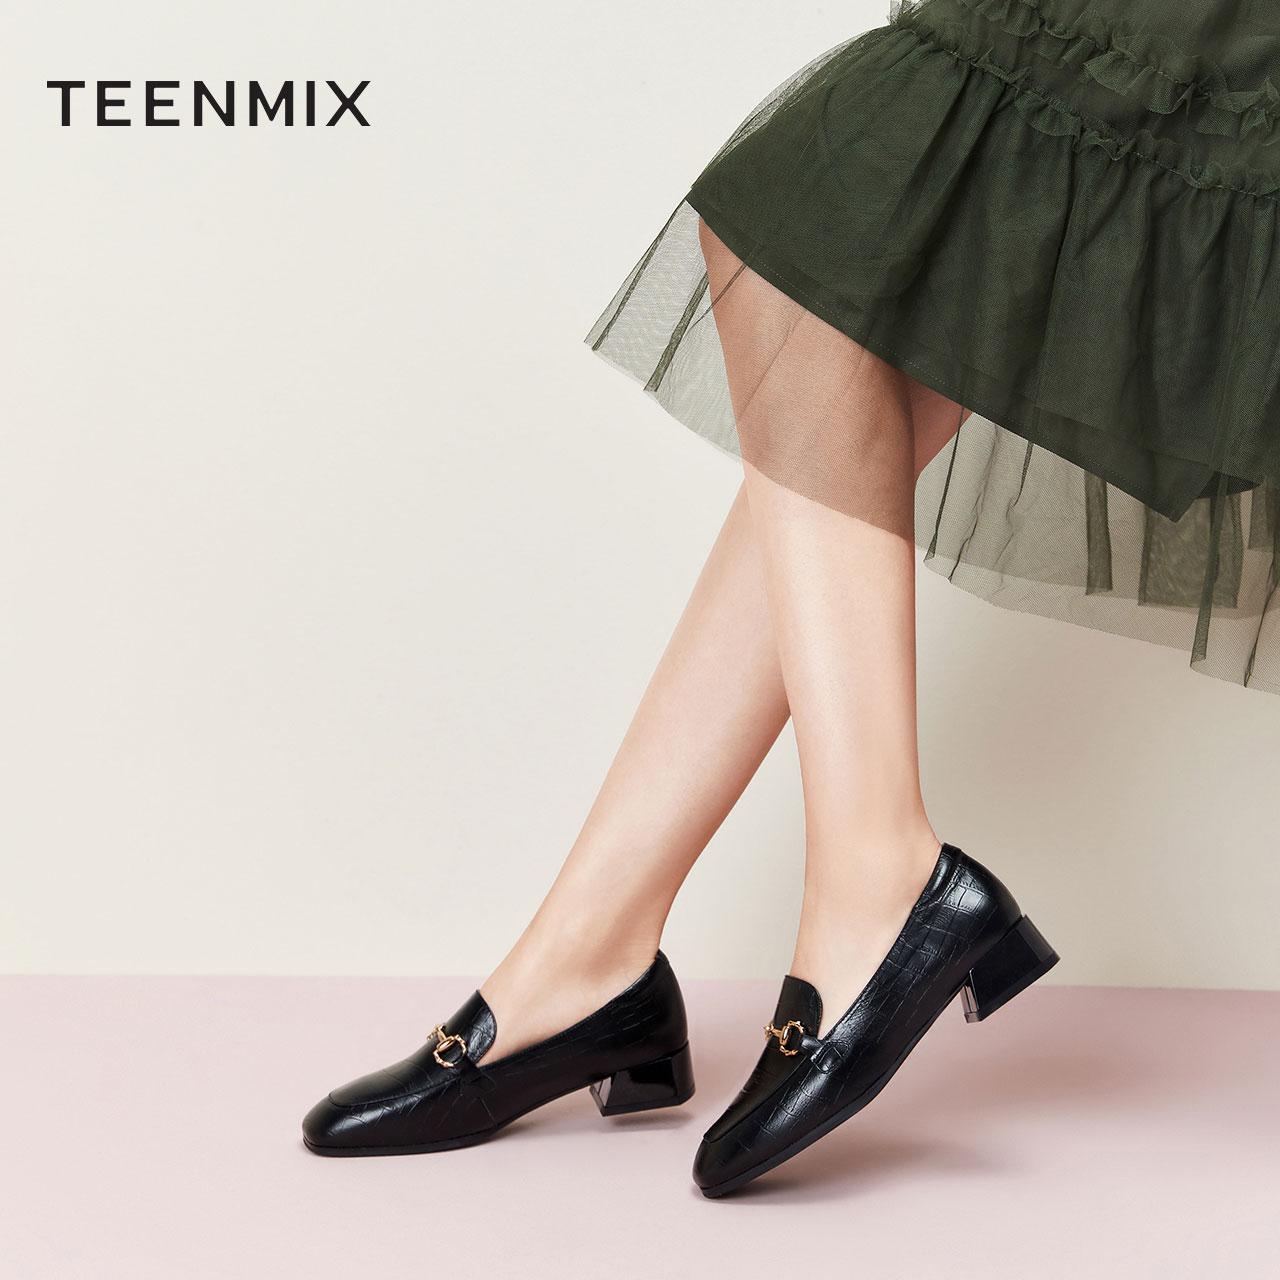 LFX04CQ0 风单鞋小皮鞋预 ol 秋季新款复古方头粗跟乐福女 2020 天美意